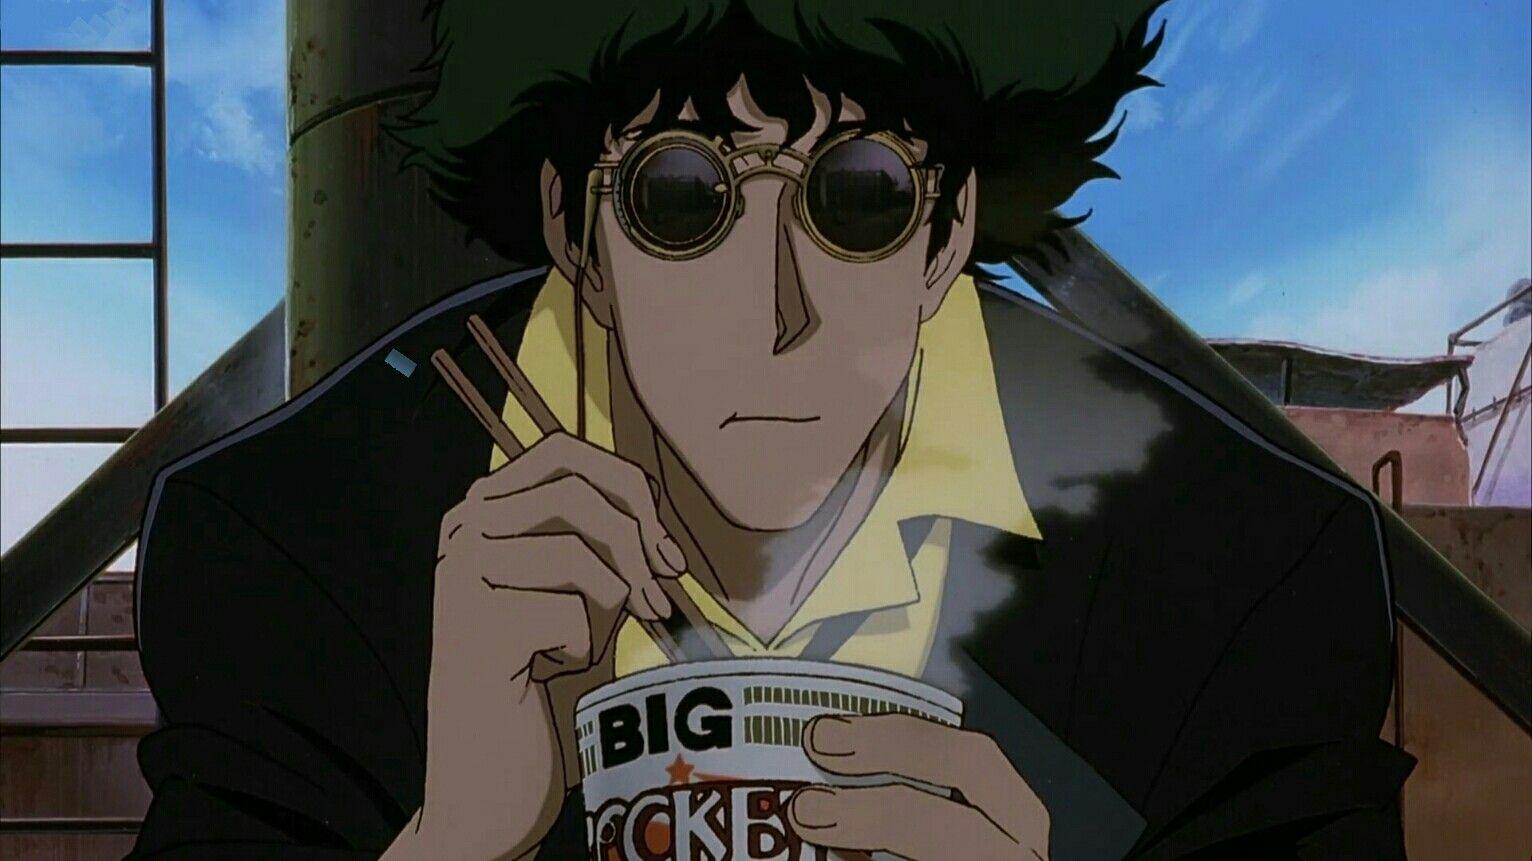 Spike Noodles Cowboy Bebop Anime Cowboy Bebop Cowboy Bebop Wallpapers